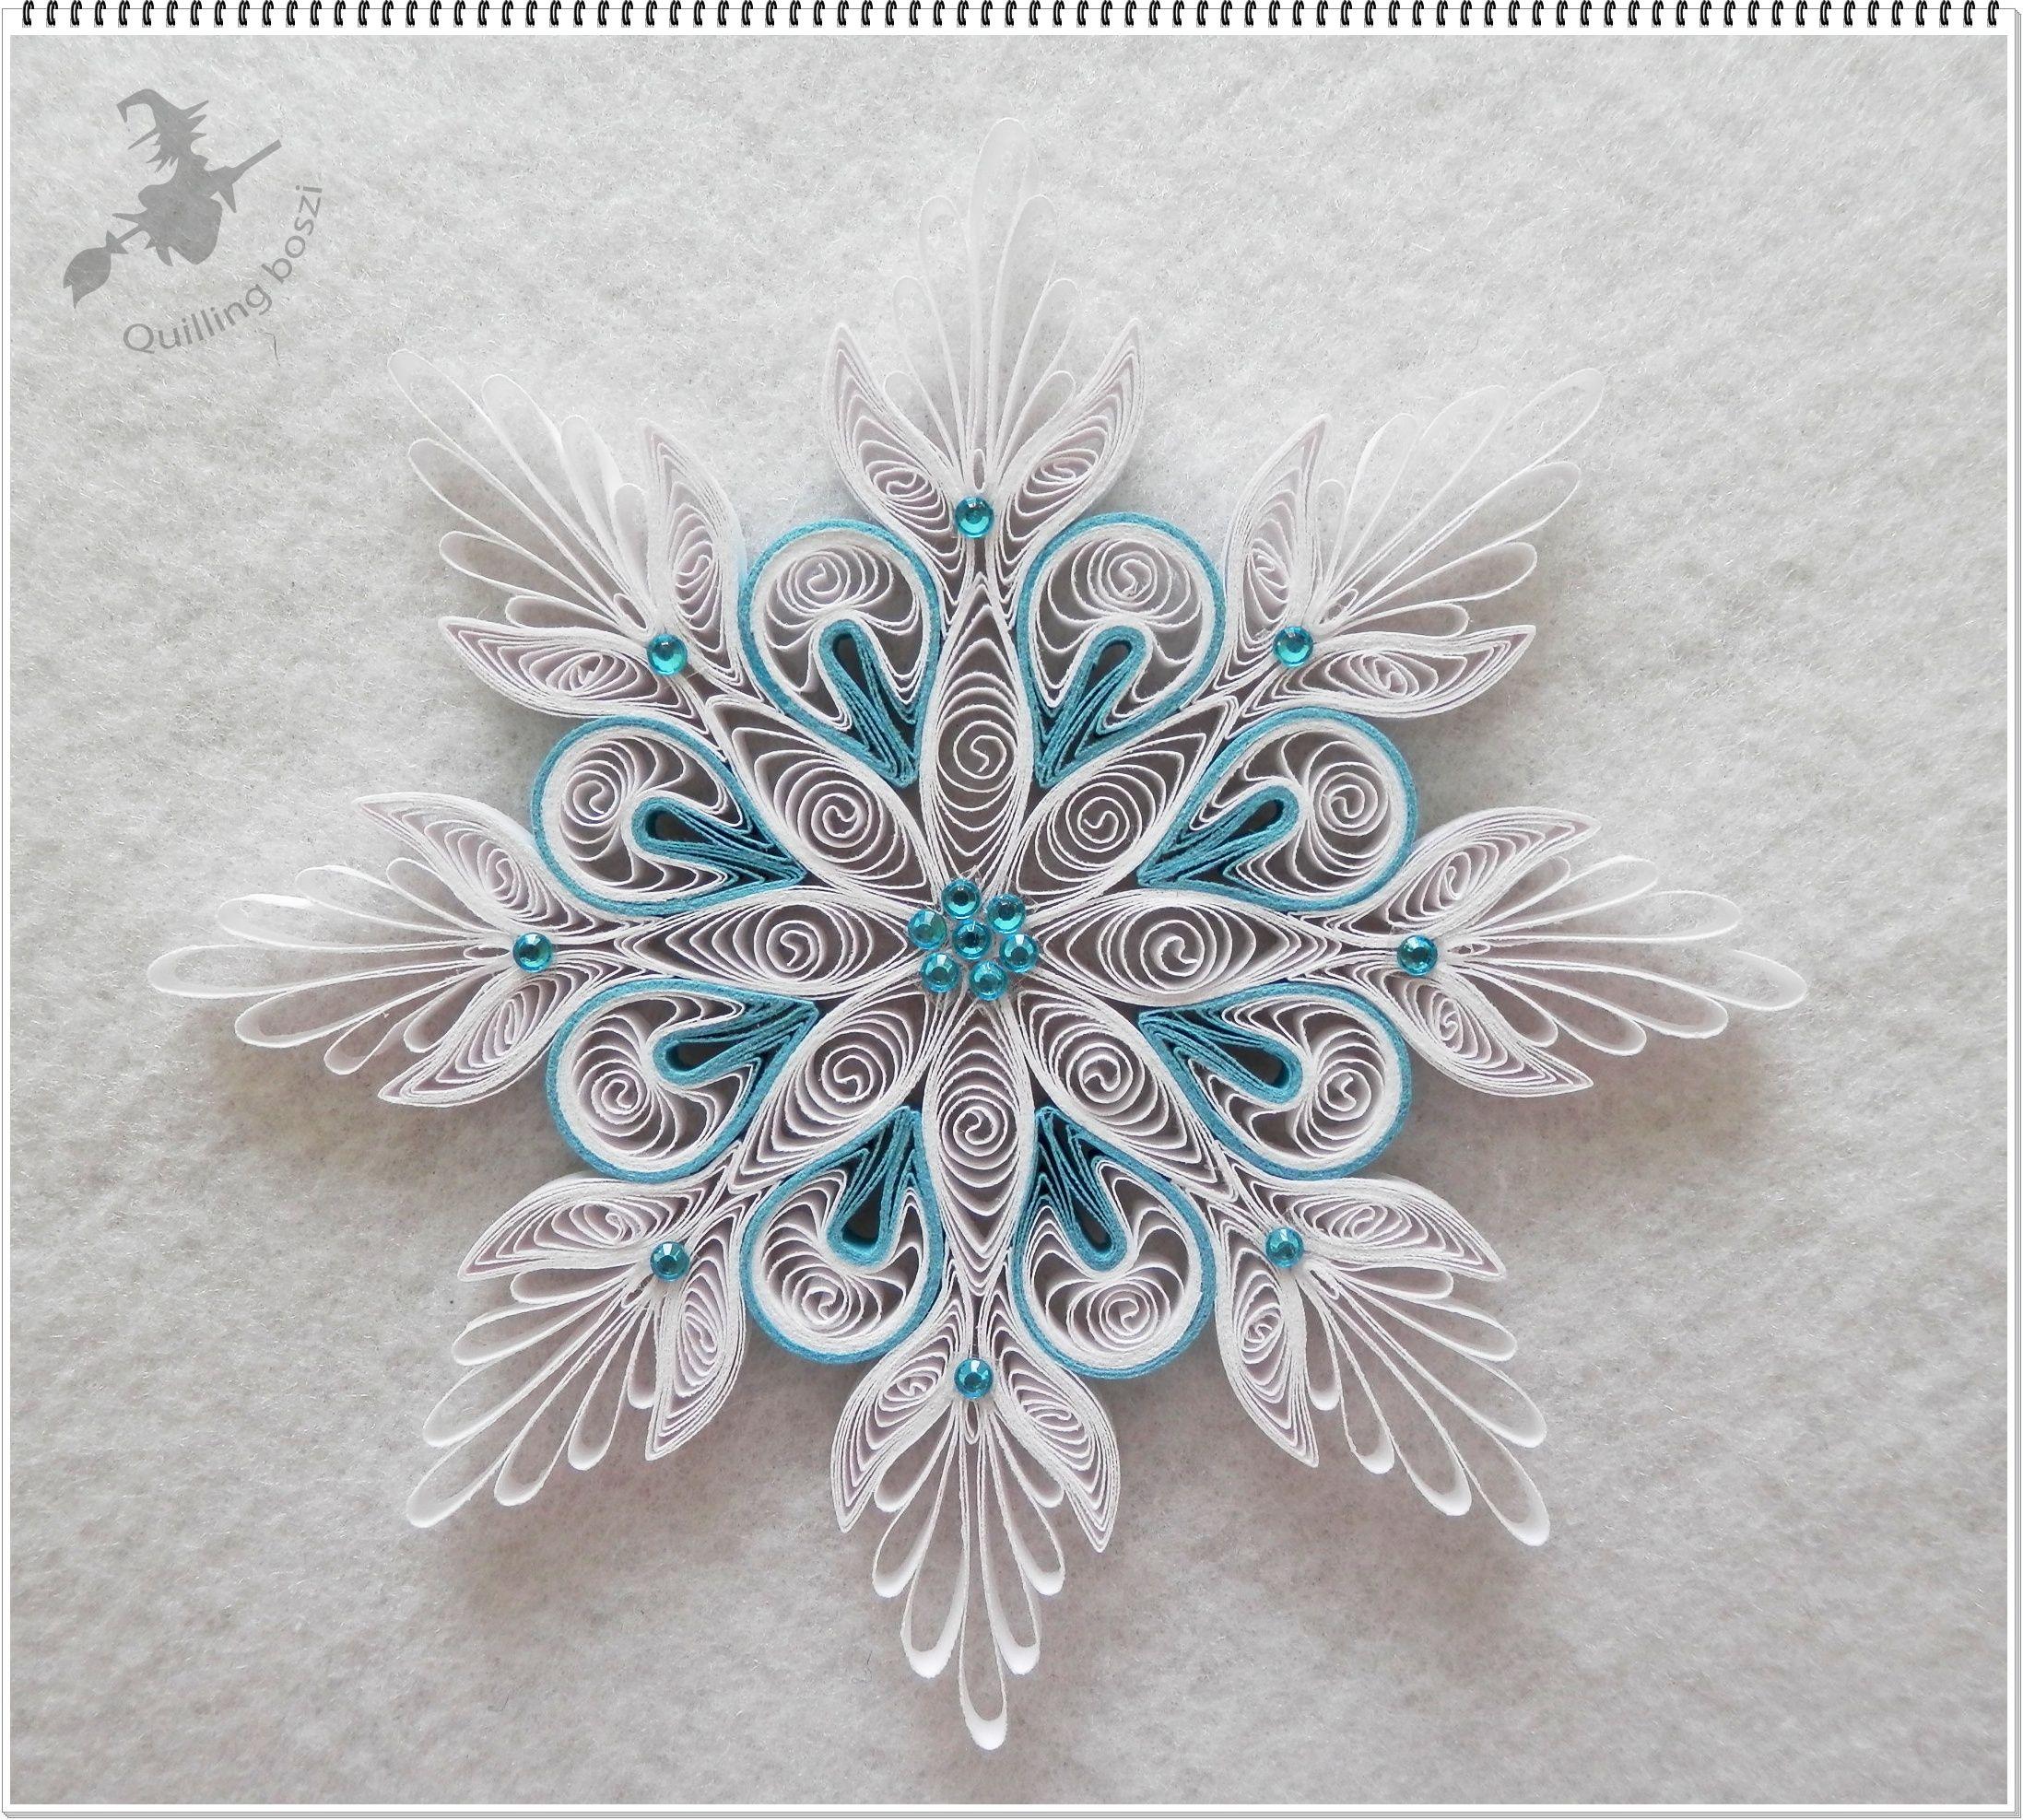 Kar csonyfa d sz quilling christmas pinterest for Quilling designs